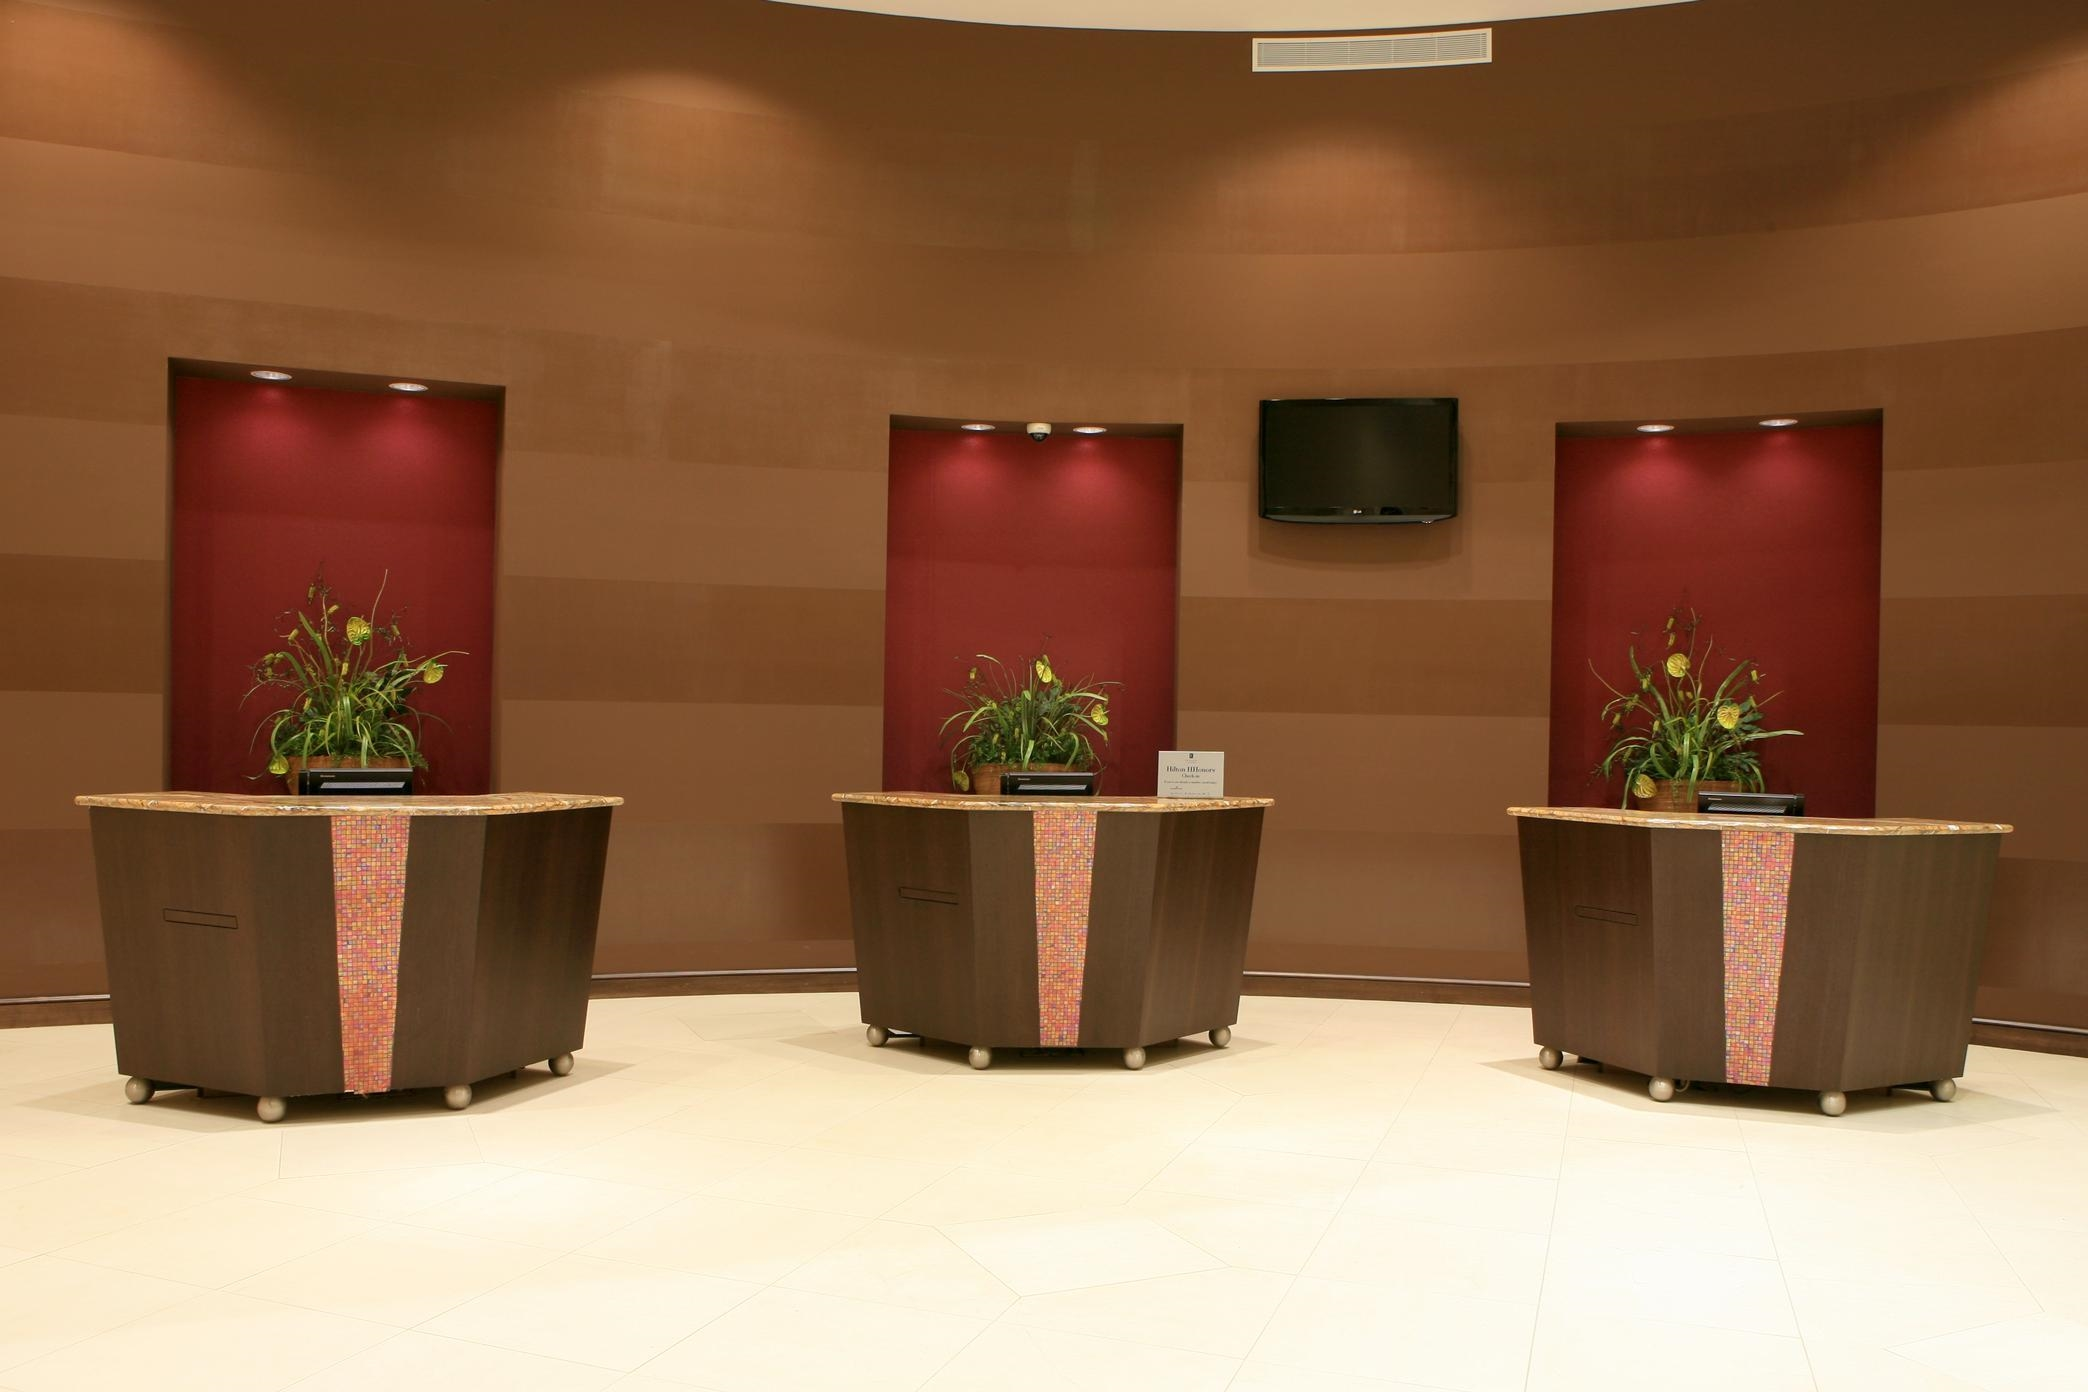 Embassy Suites by Hilton Birmingham Hoover image 6